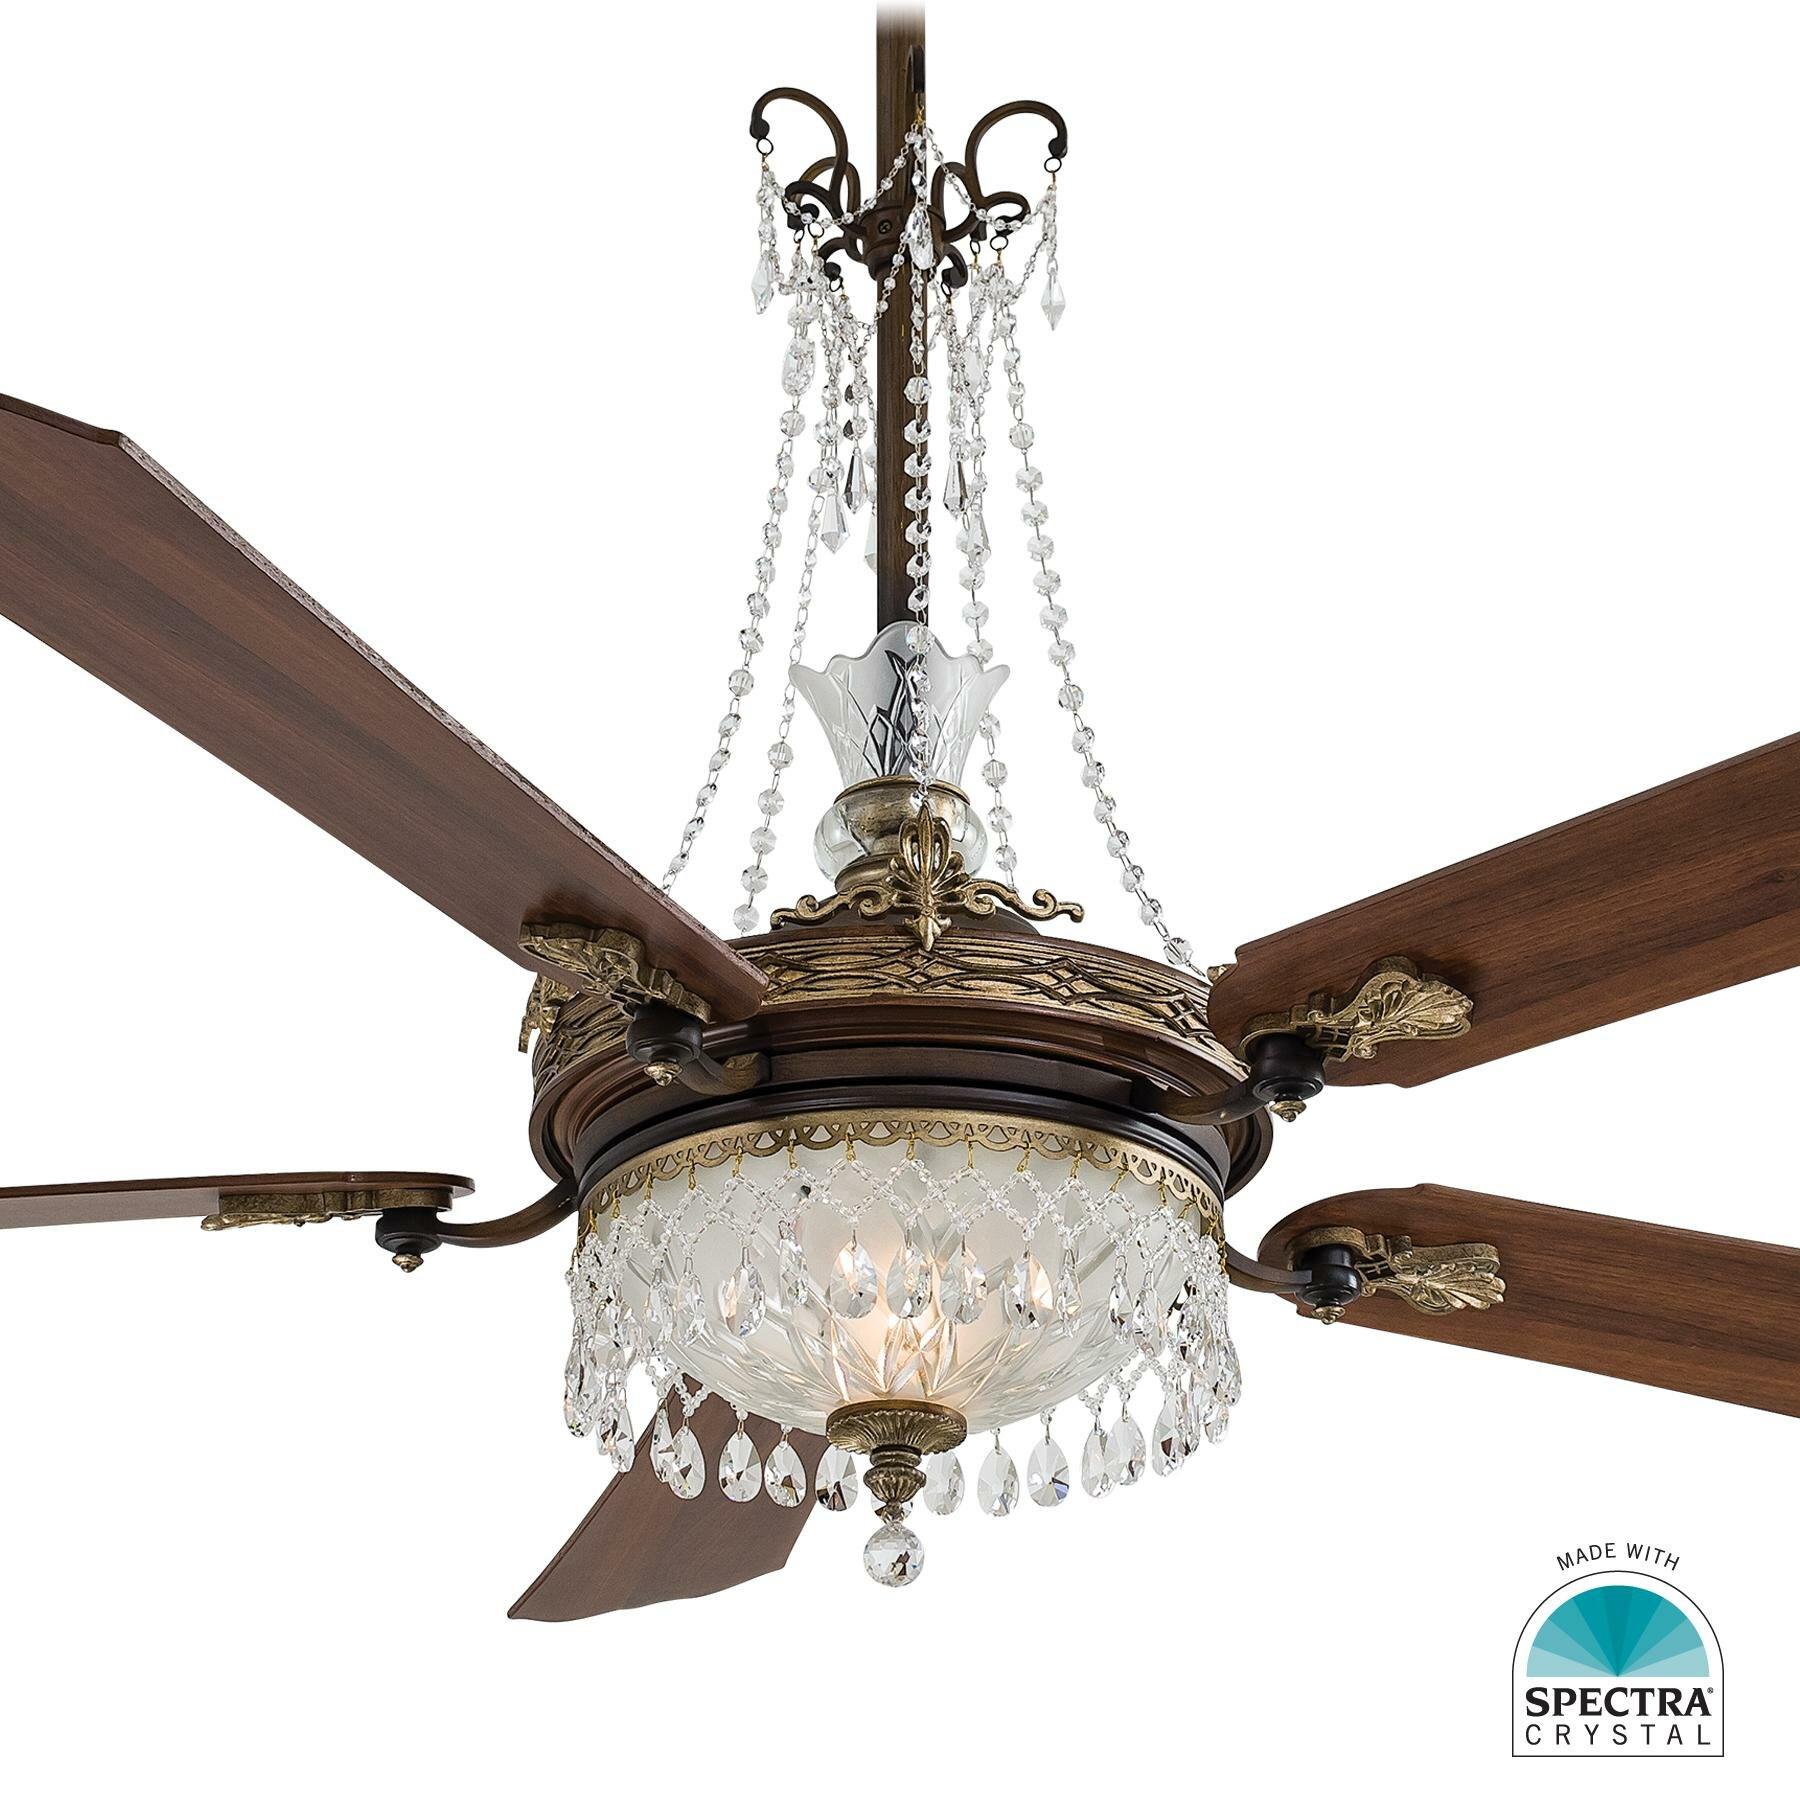 Minka aire cristafano chandelier ceiling fan light kit wayfair arubaitofo Gallery